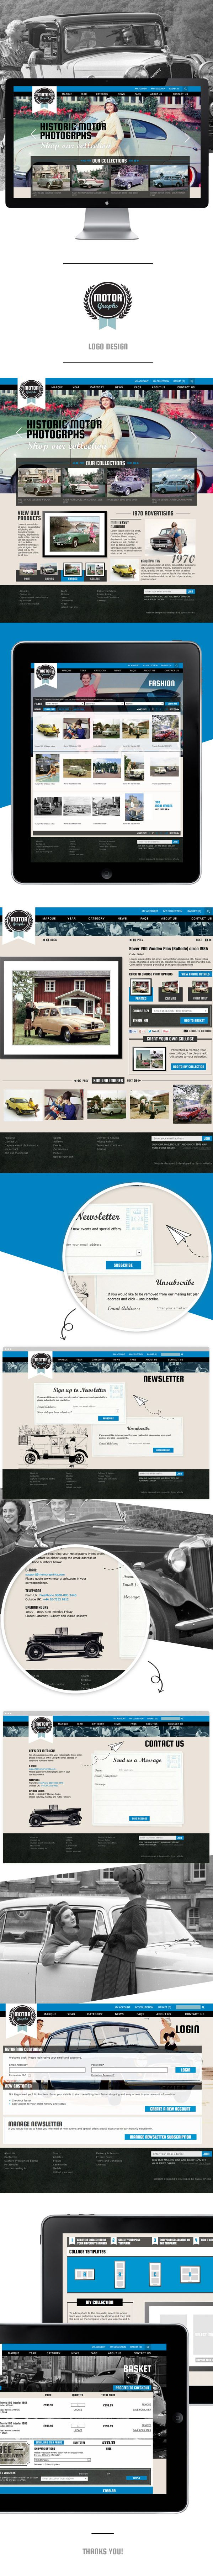 Motor Graphs website design by Ge Song, via Behance